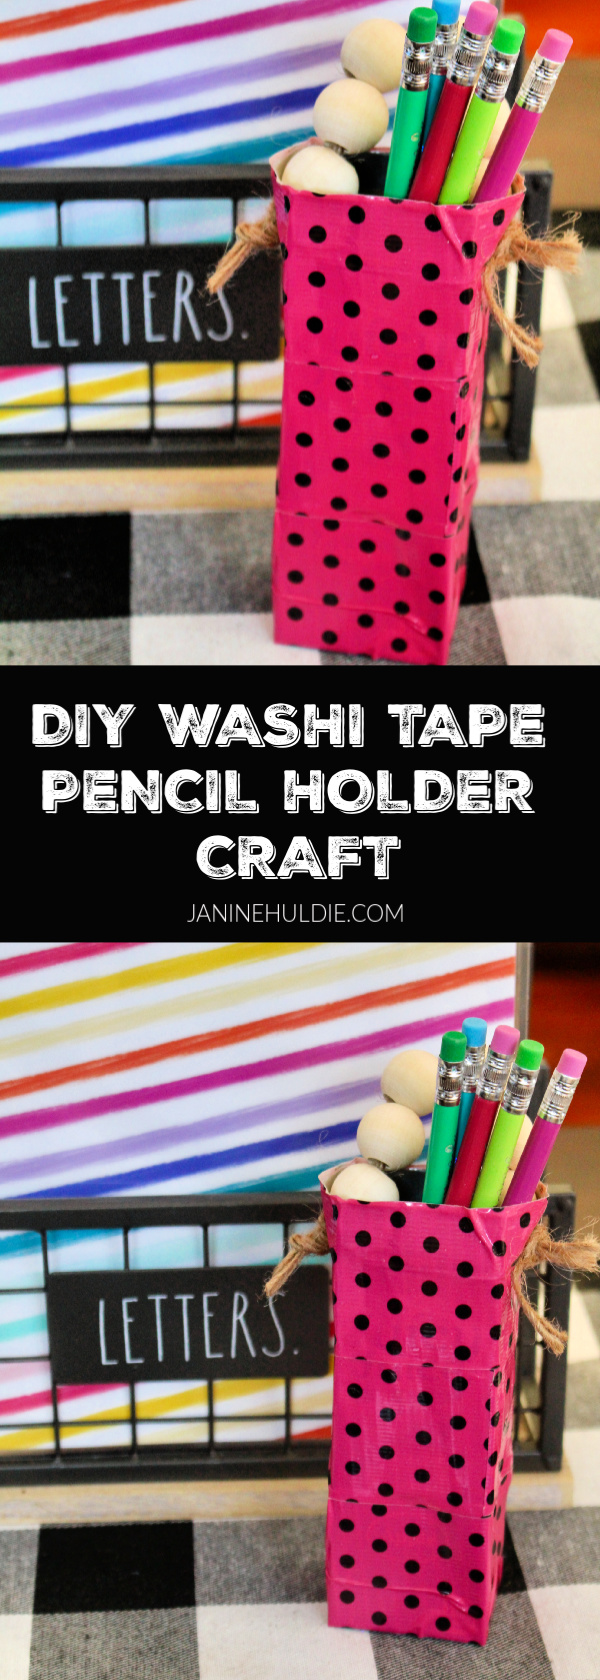 DIY Washi Tape Pencil Holder